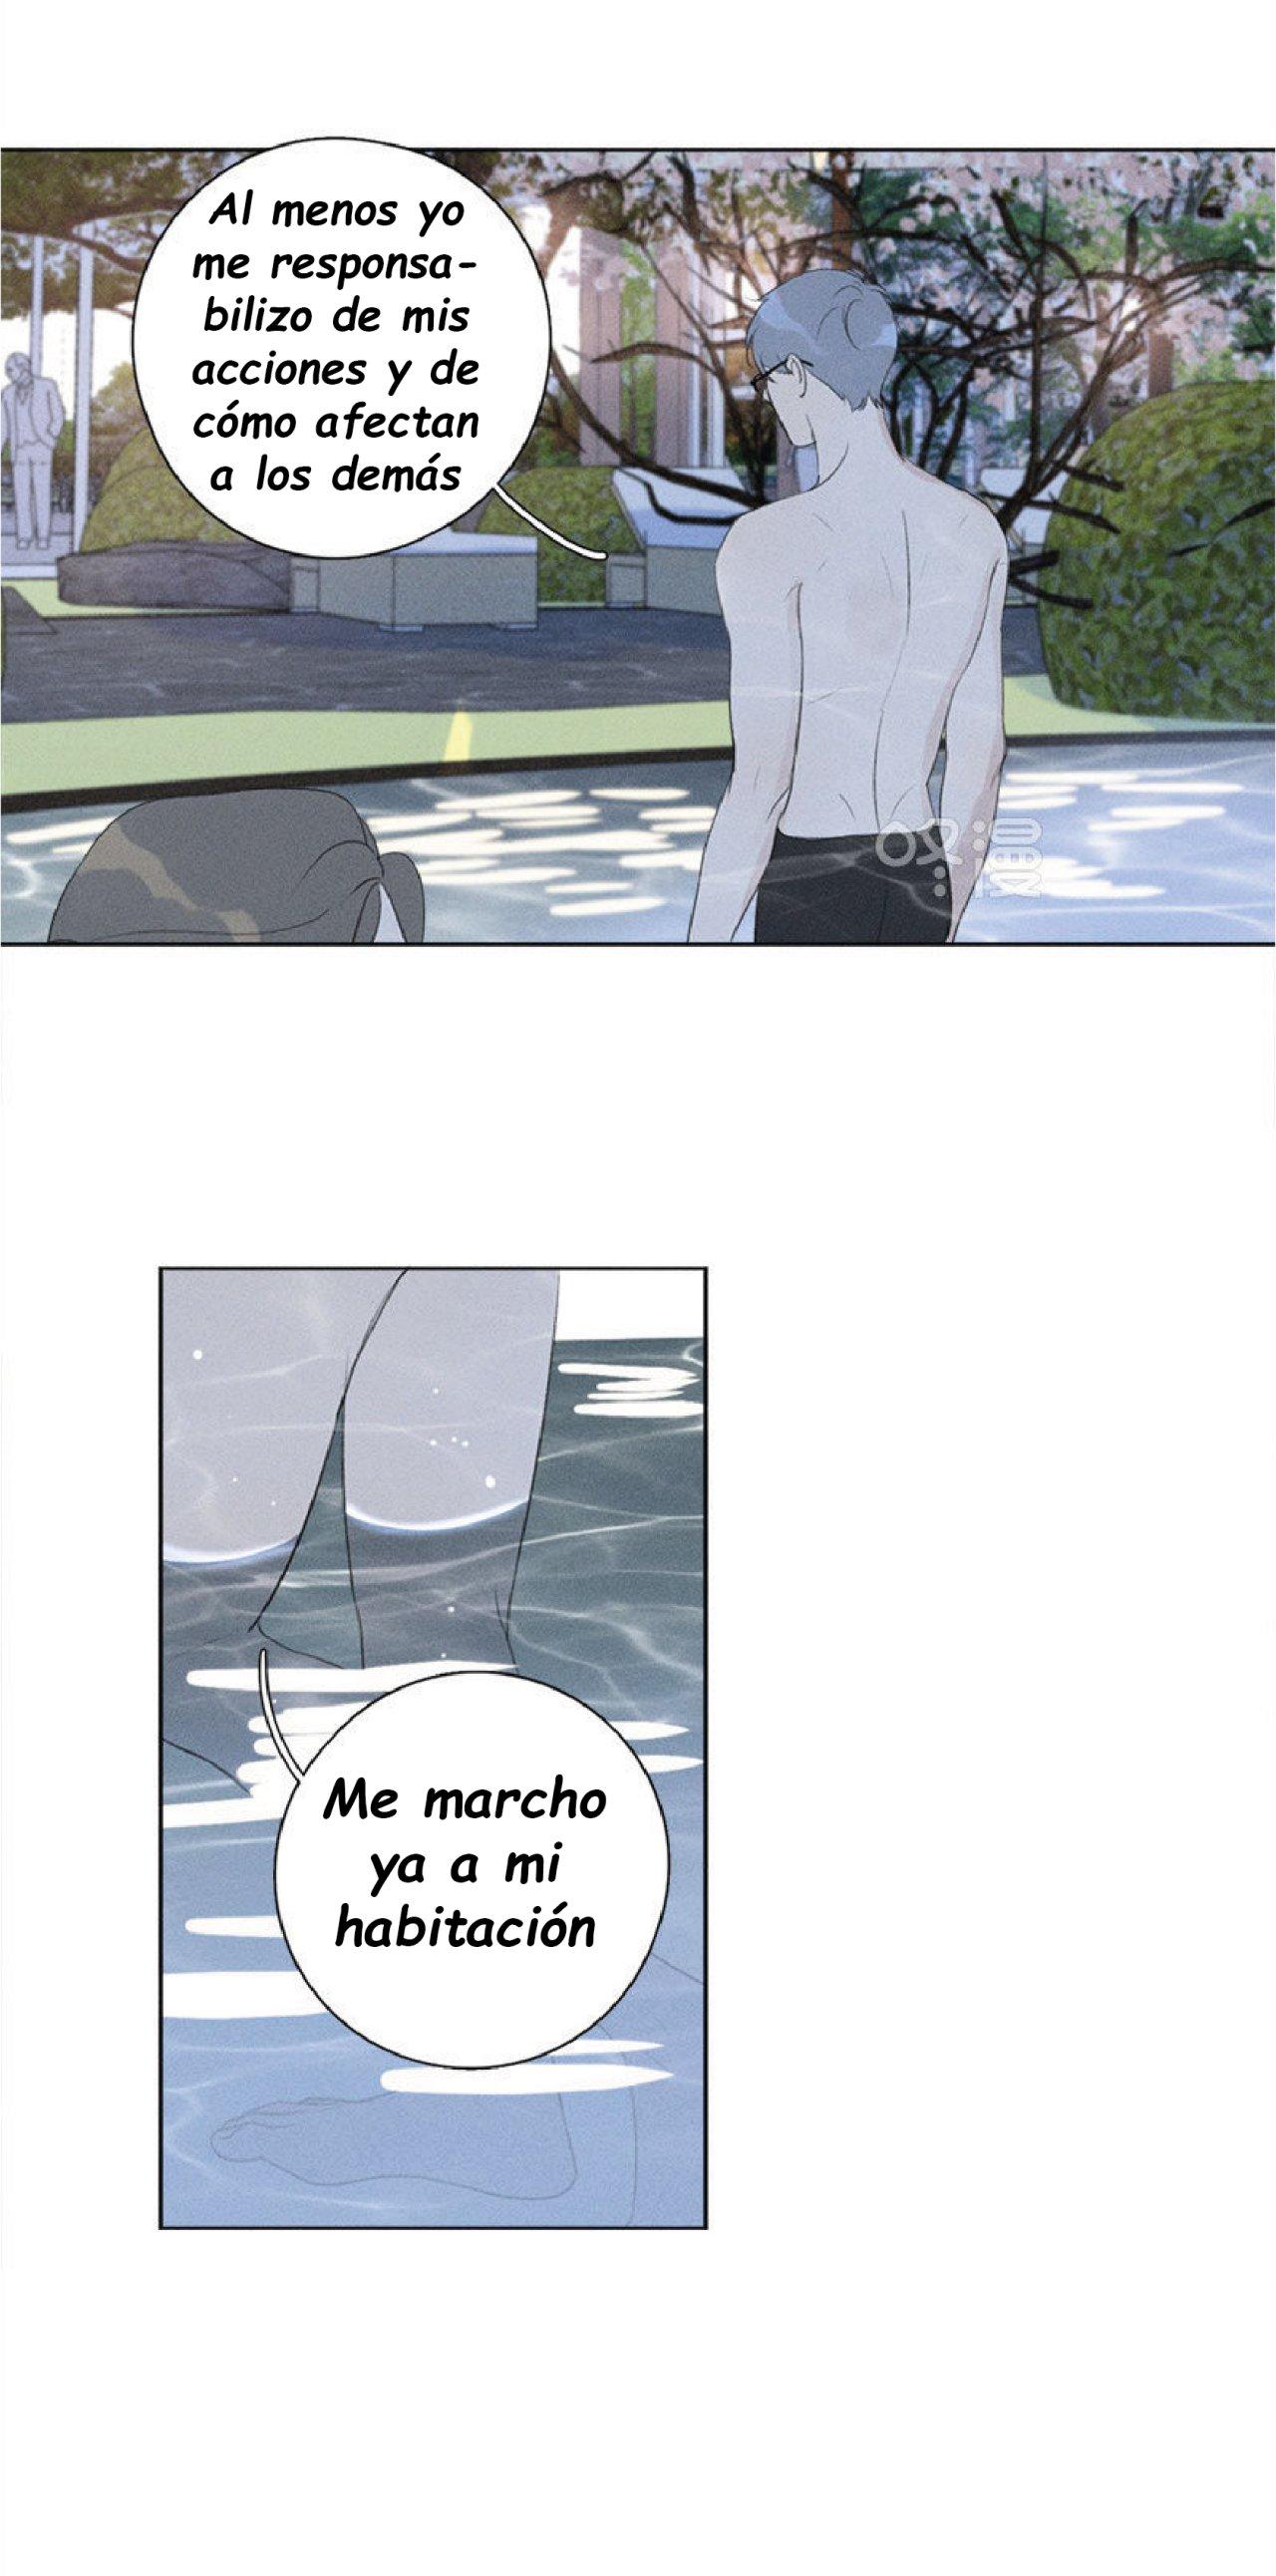 https://nine.mangadogs.com/es_manga/pic8/29/24925/957375/76cb696d89f827c907d66d9388d96553.jpg Page 15